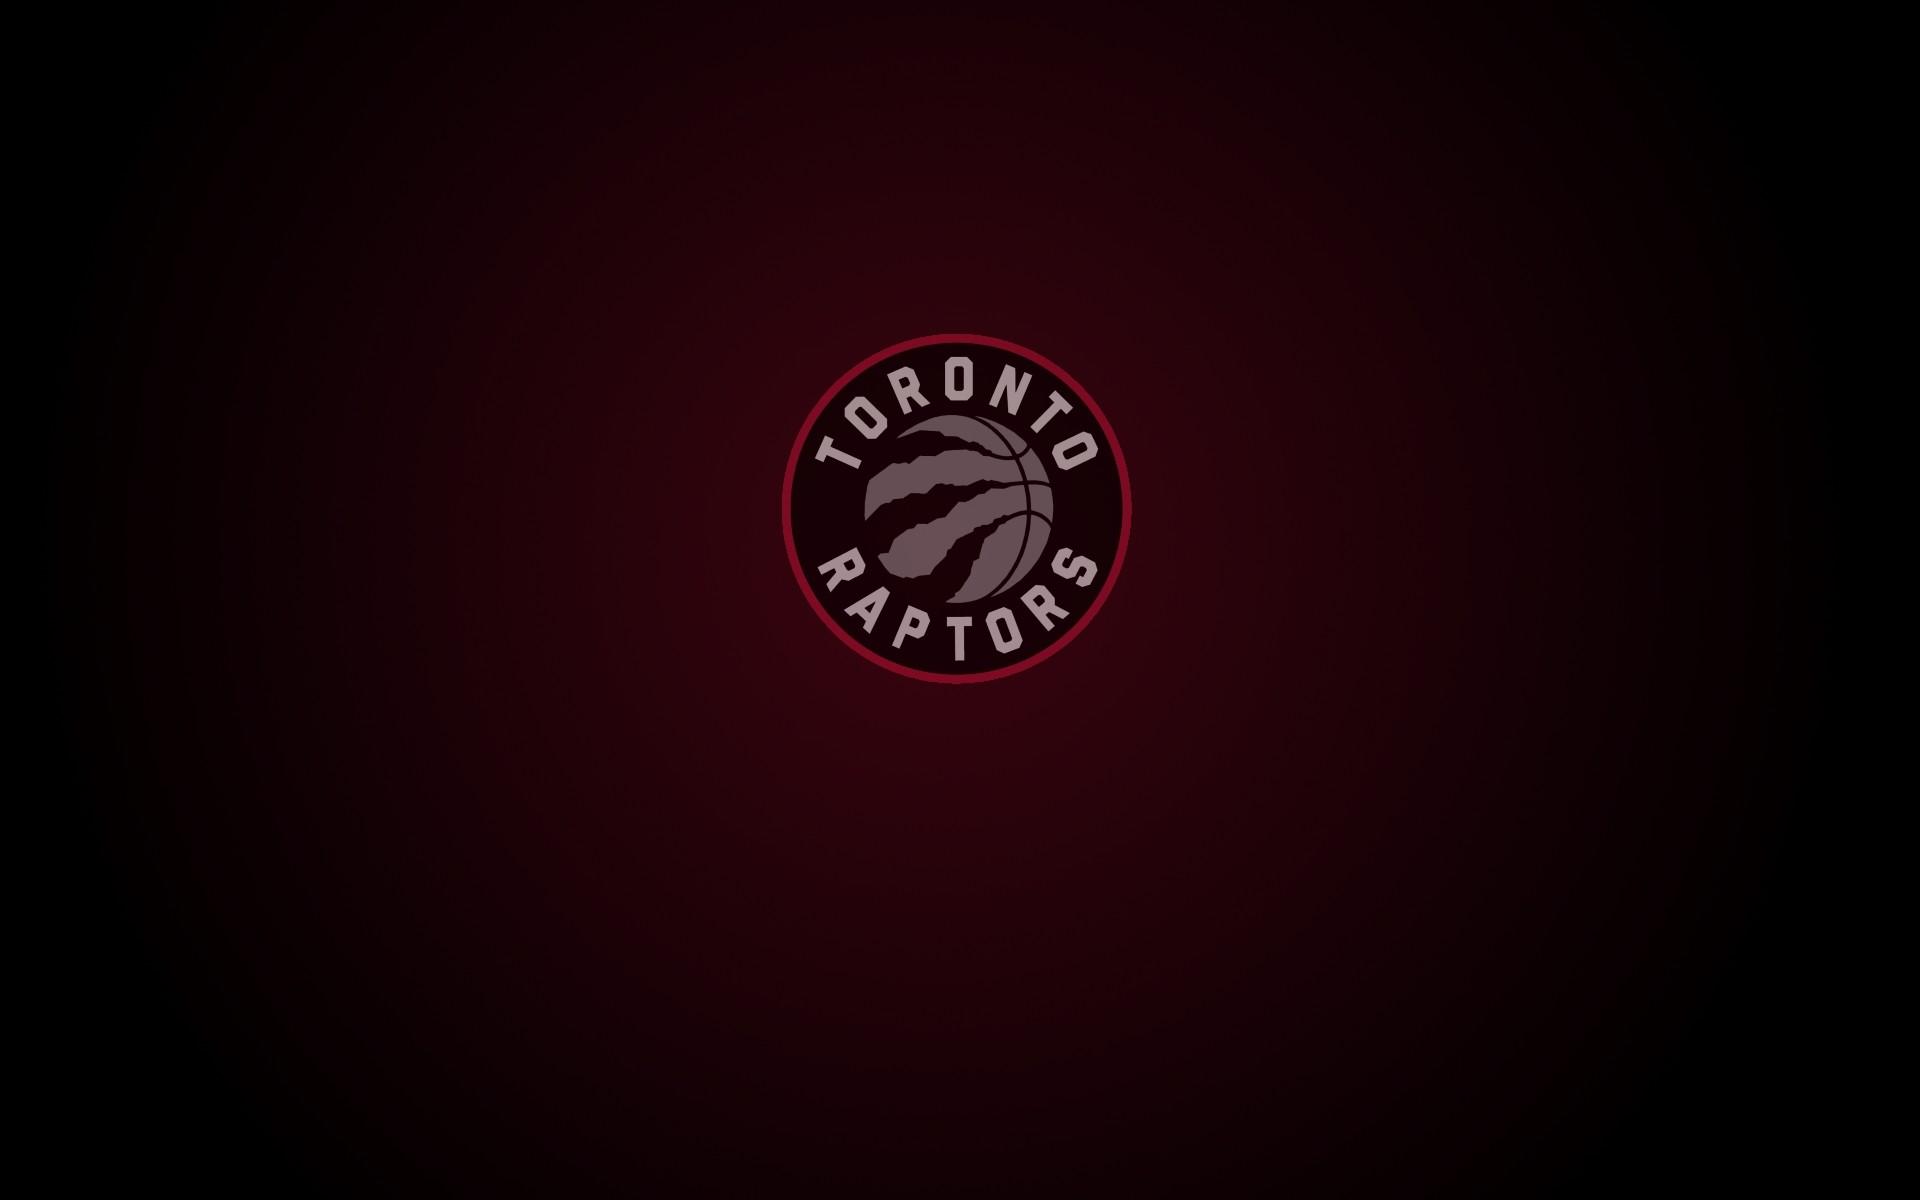 Toronto Raptors – Logos Download